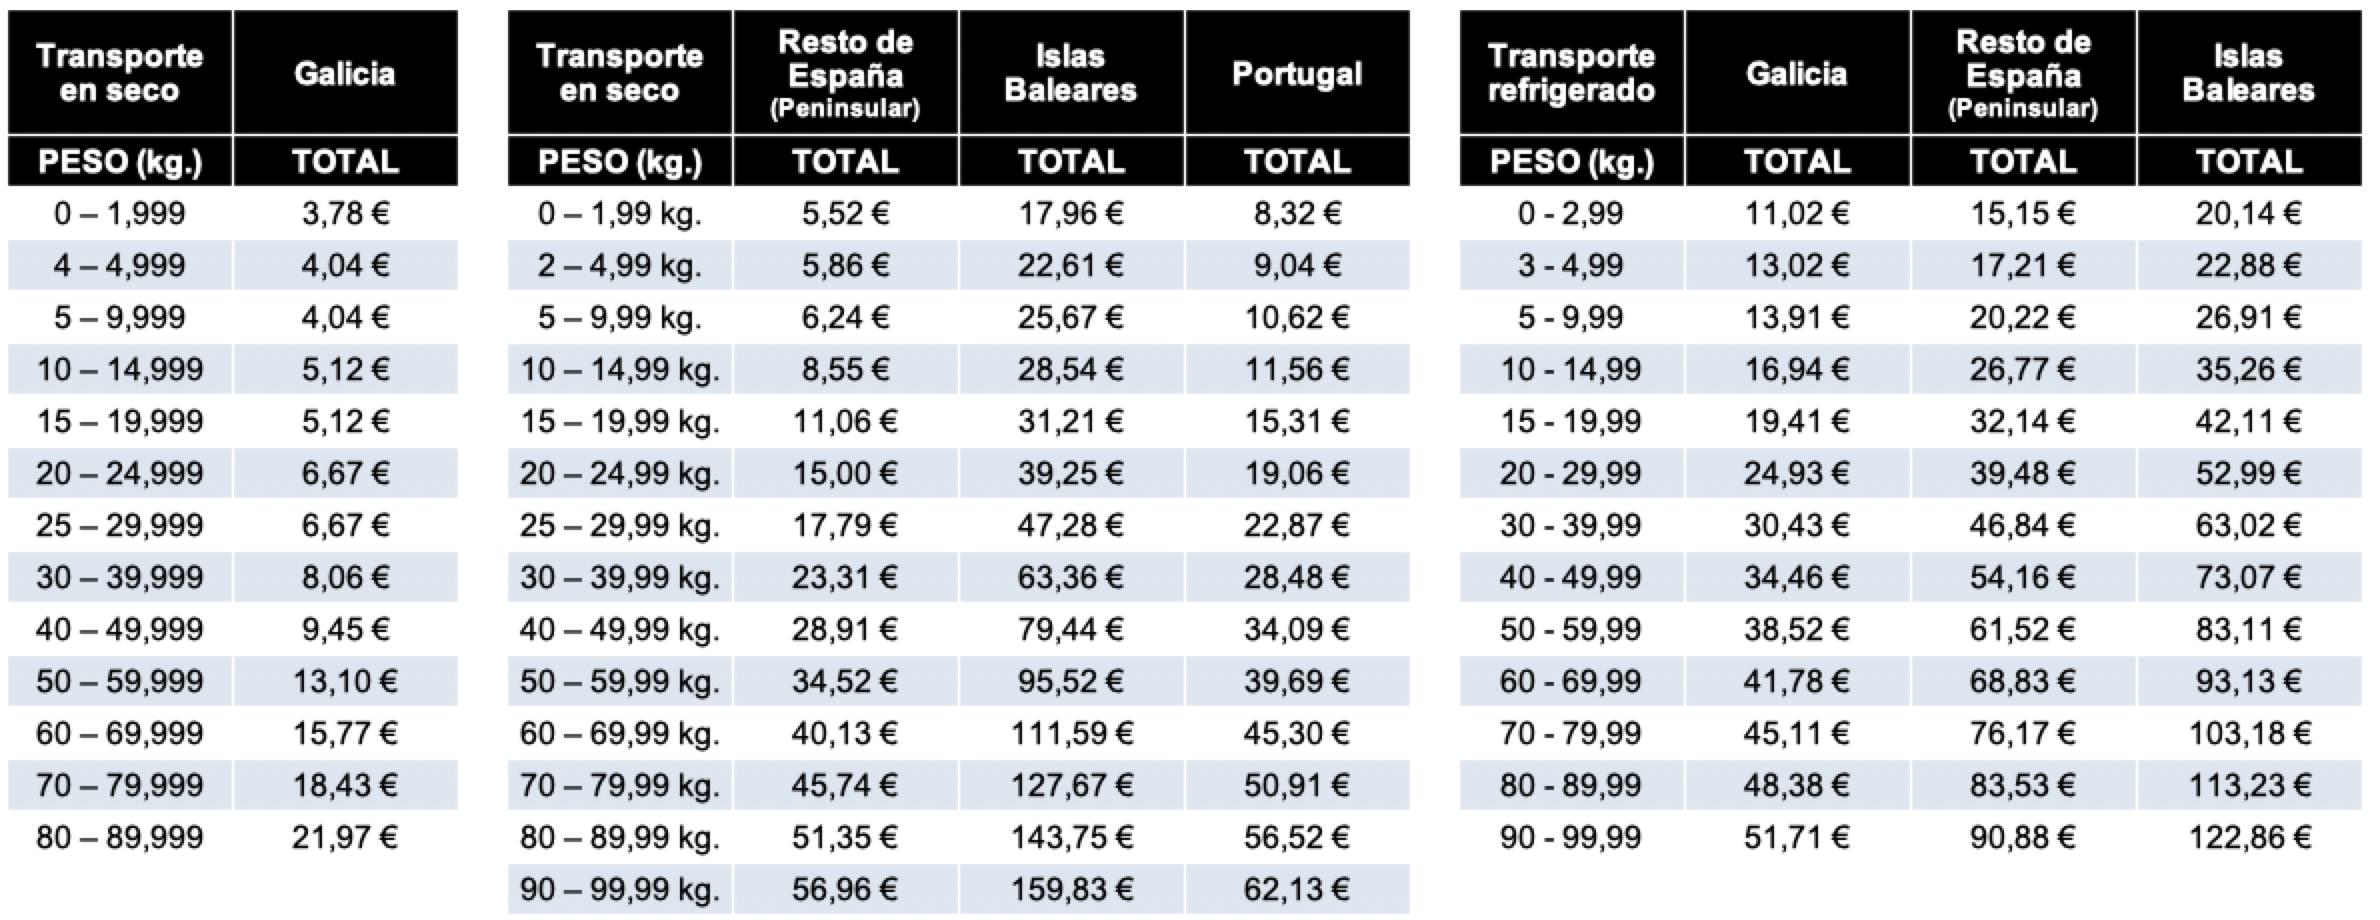 transporte-galicia-españa-baleares-portugal-2.jpg